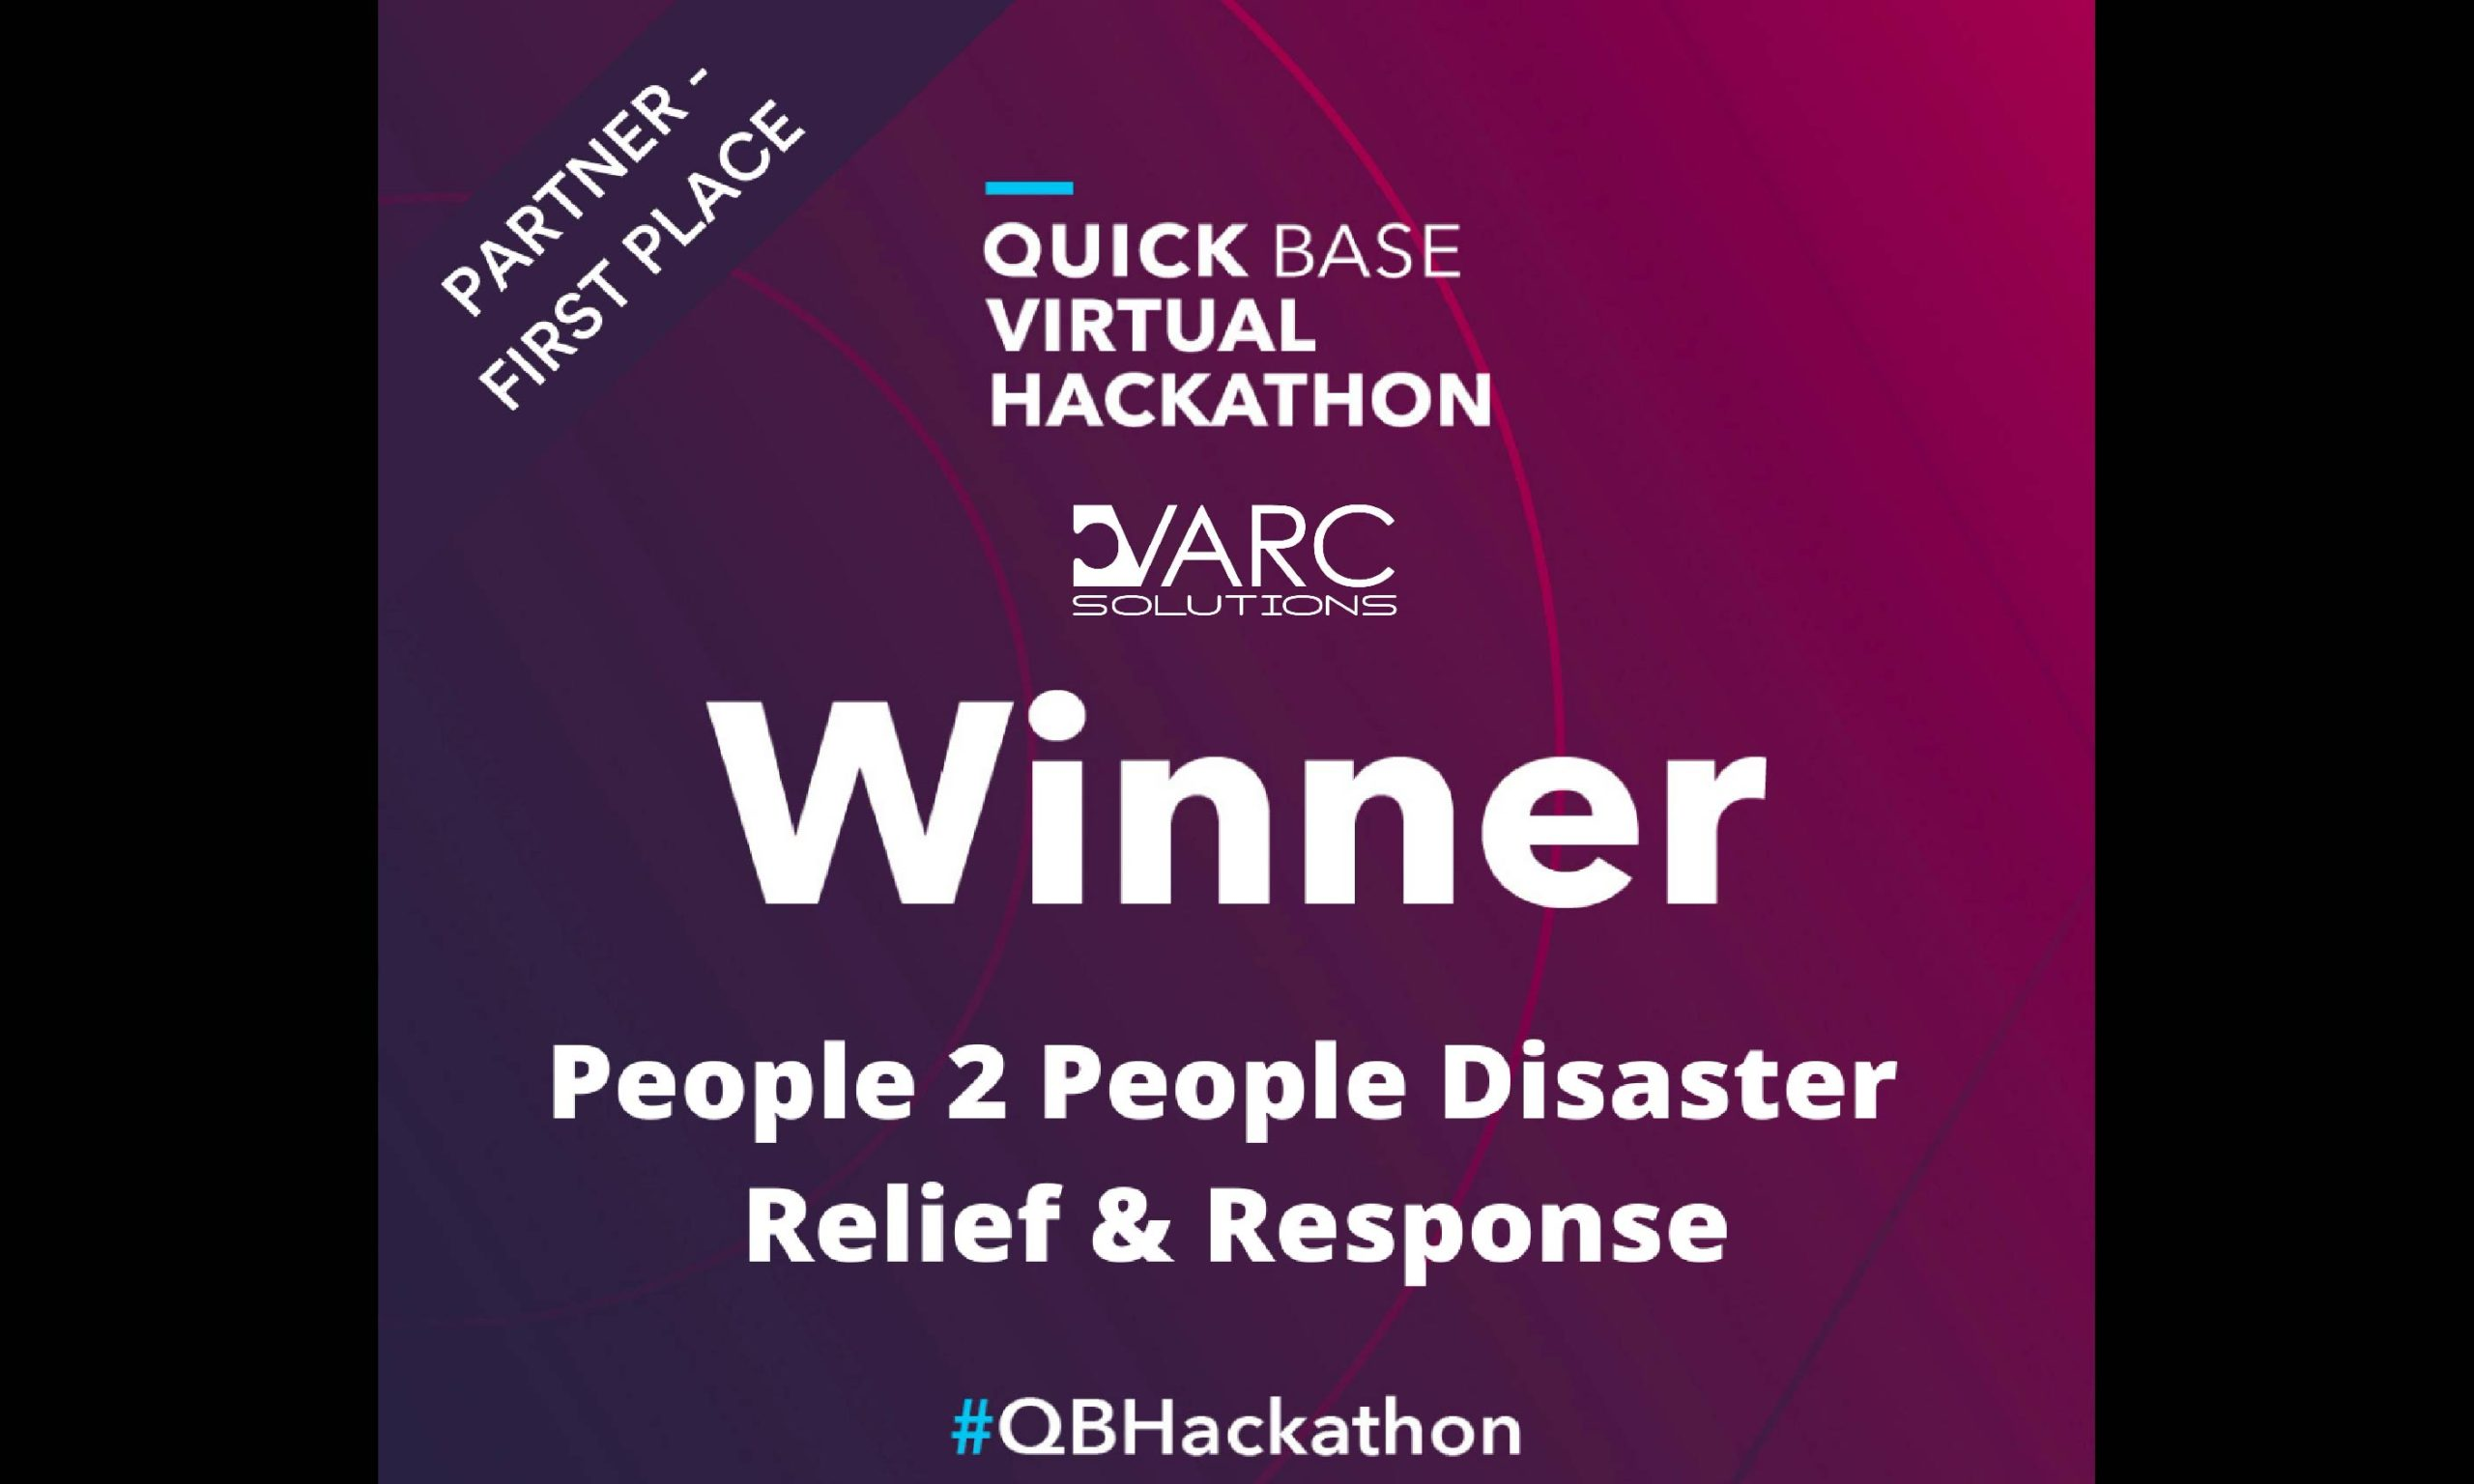 Quick Base Hackathon Winner